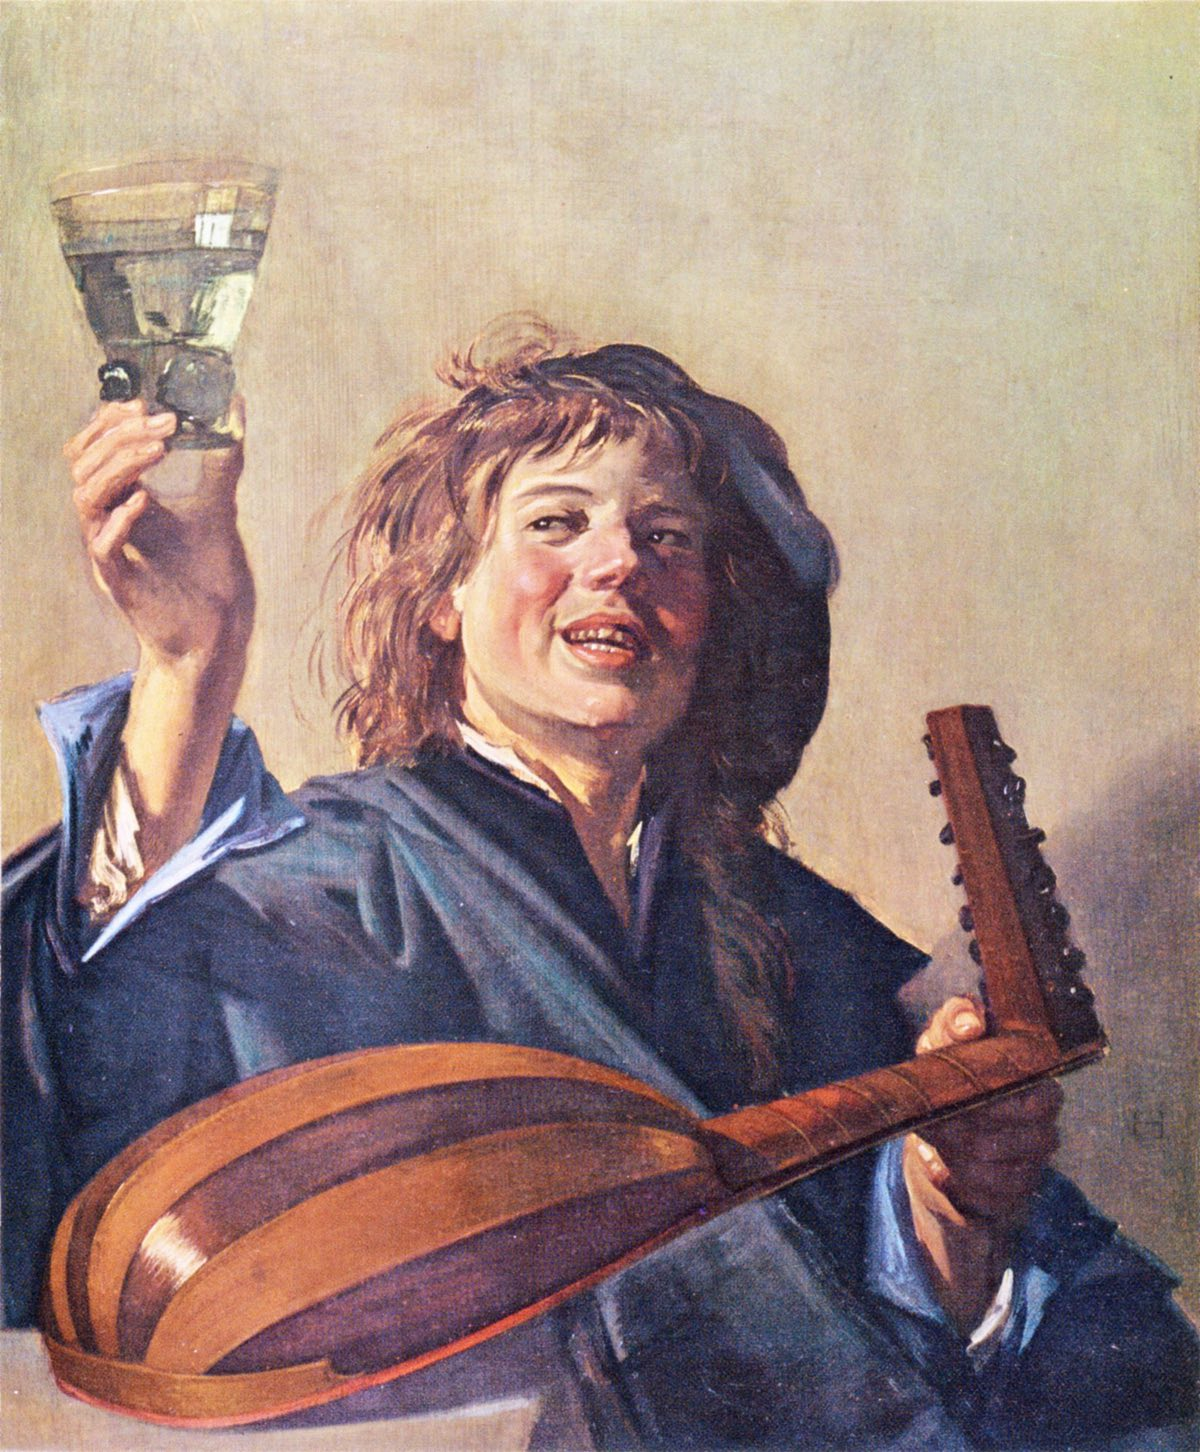 El músico de laúd feliz (1626), de Frans Hals